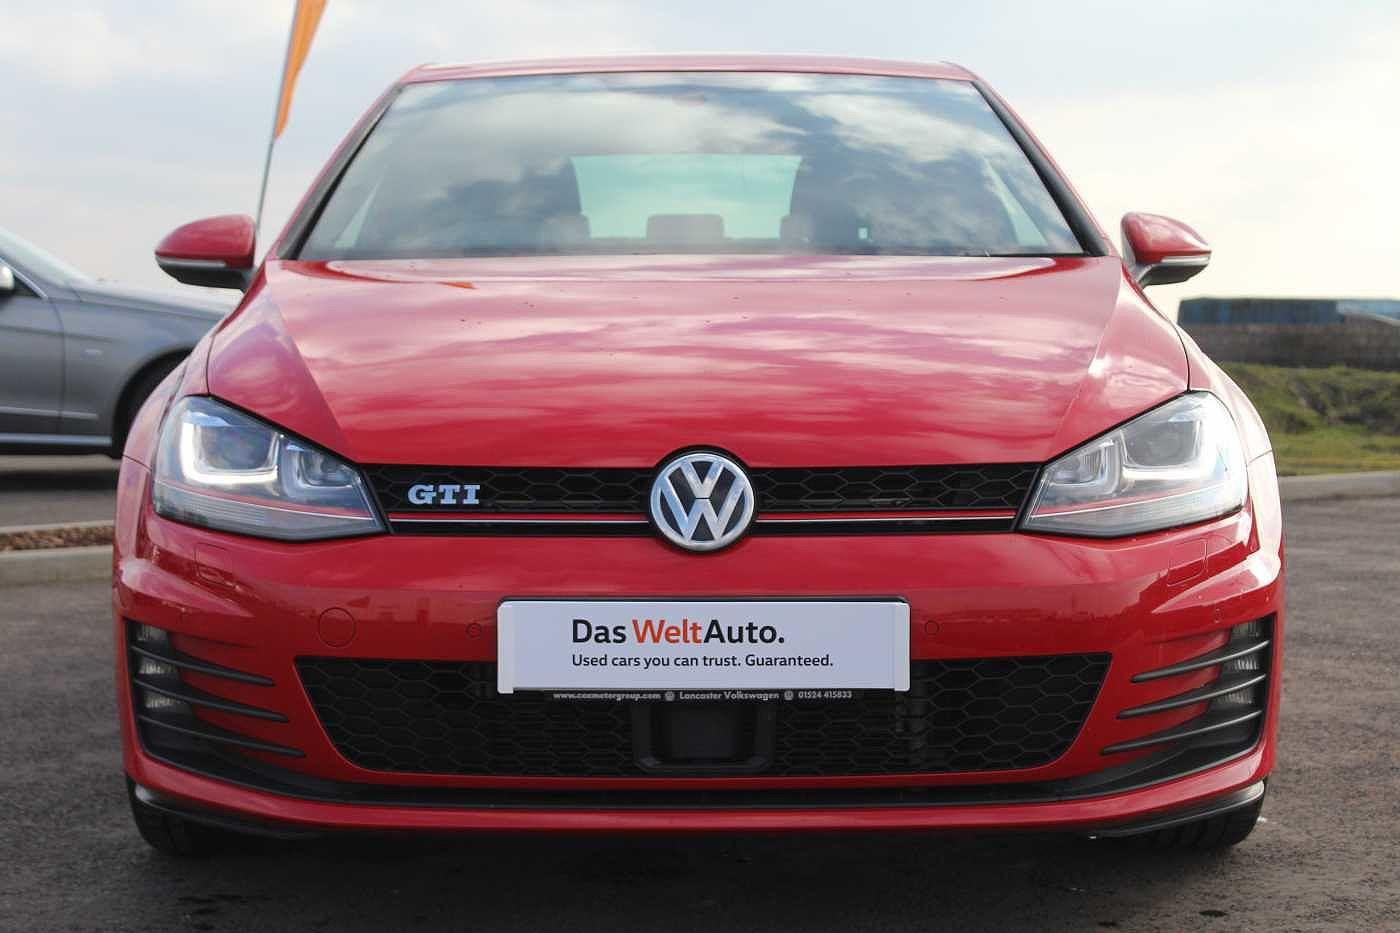 Volkswagen Golf 2.0 TSI GTI 220PS